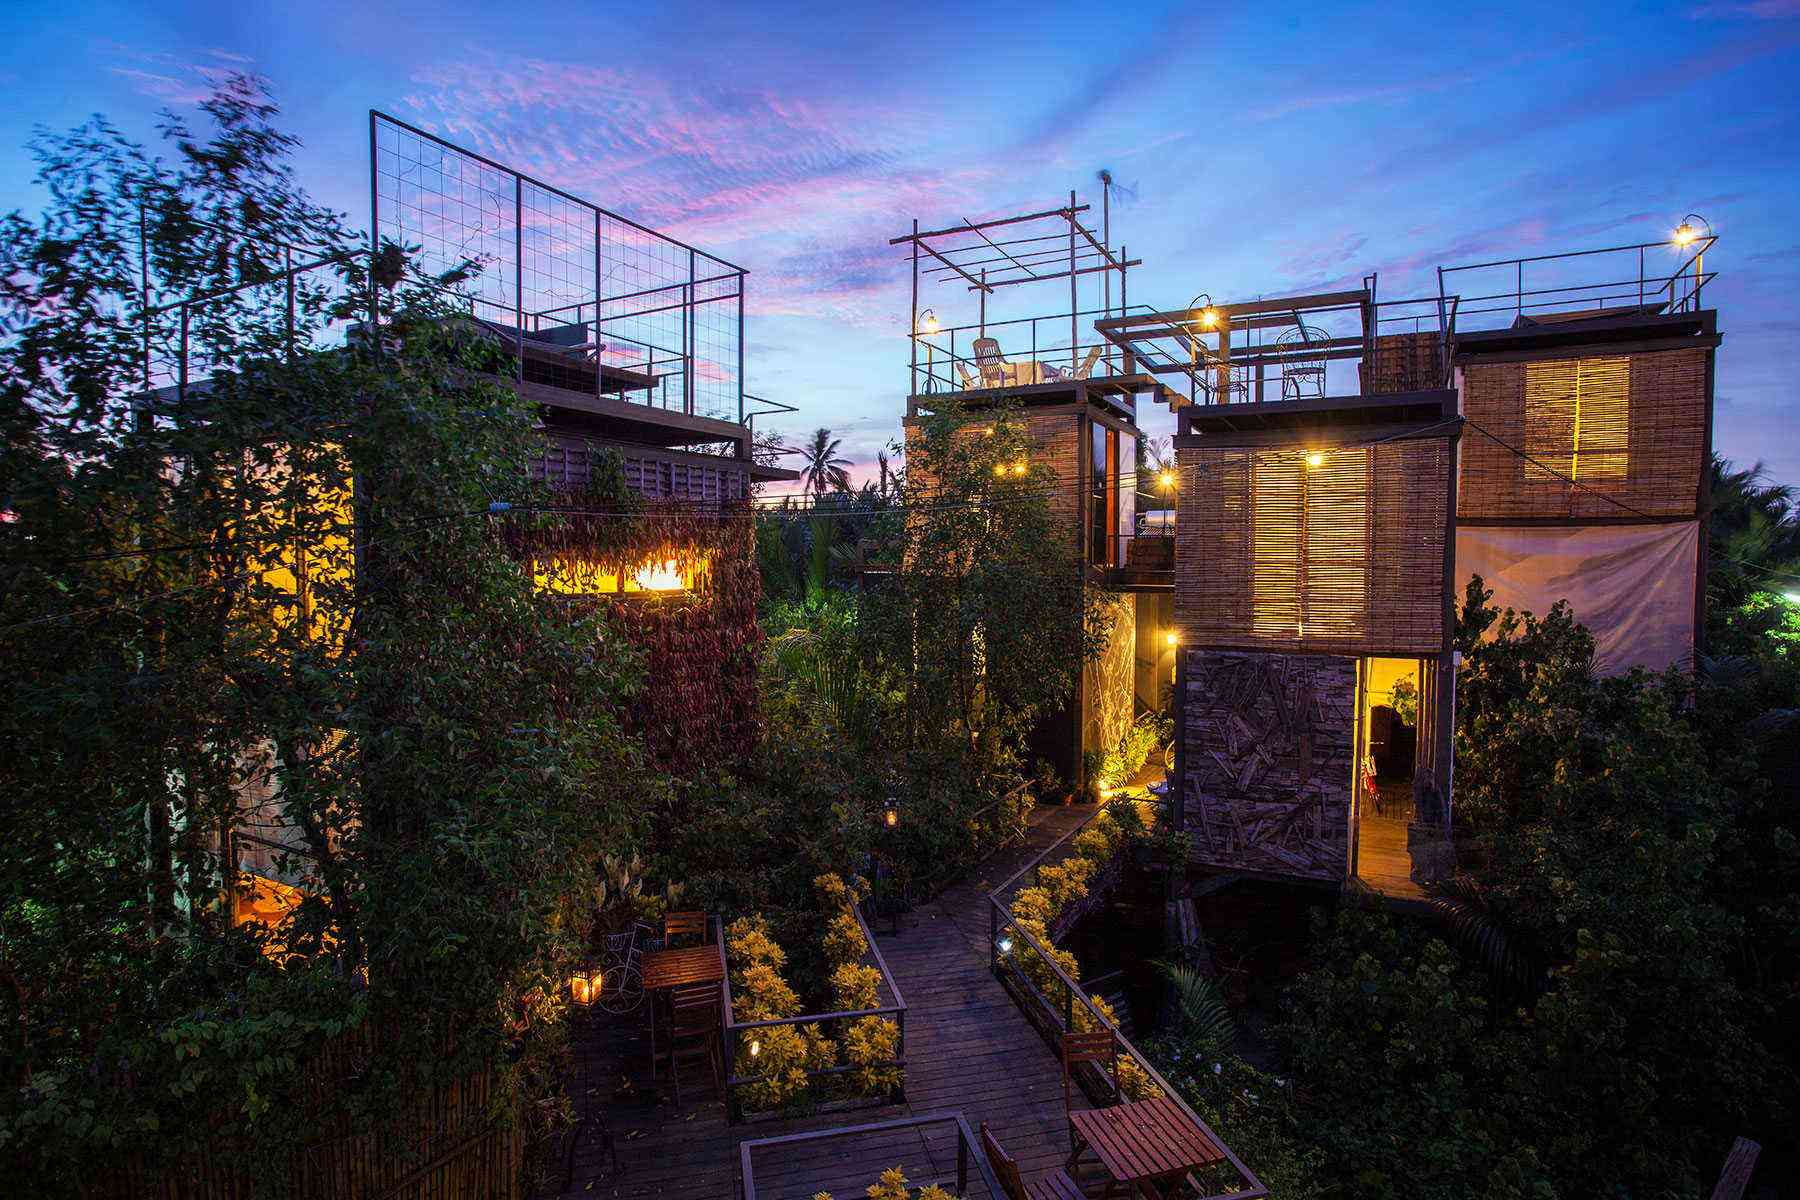 Unusual-Treehouses-Bangkok-Treehouse-2